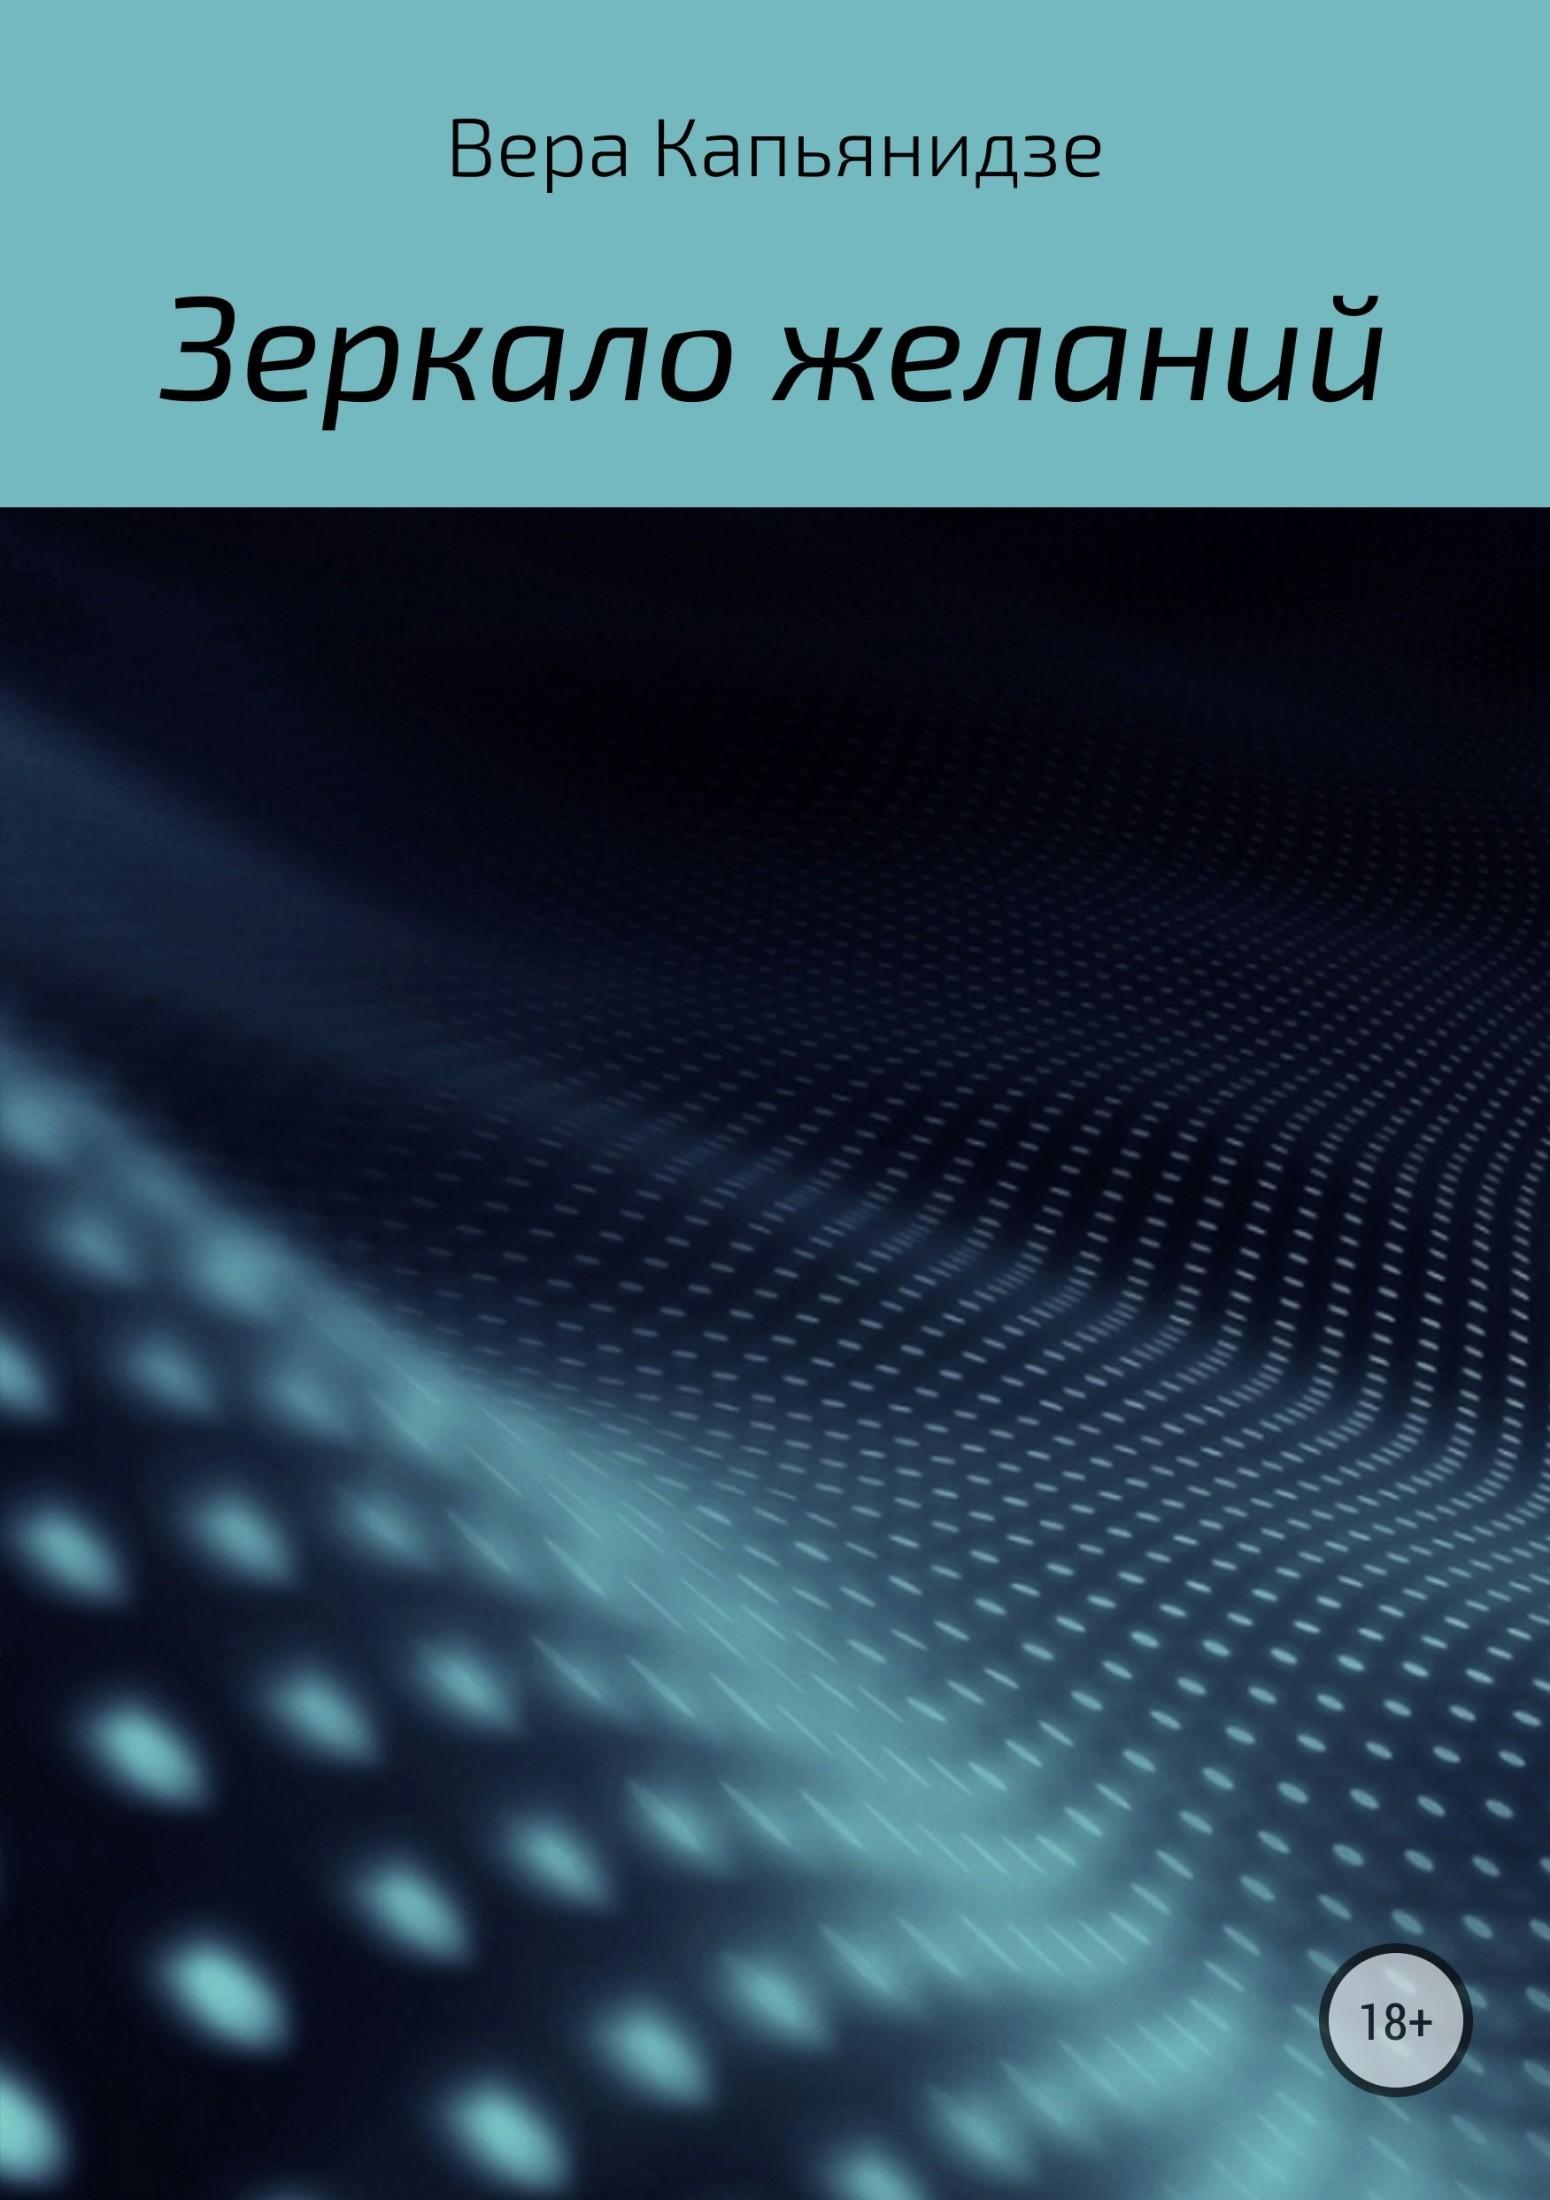 Вера Капьянидзе - Зеркало желаний